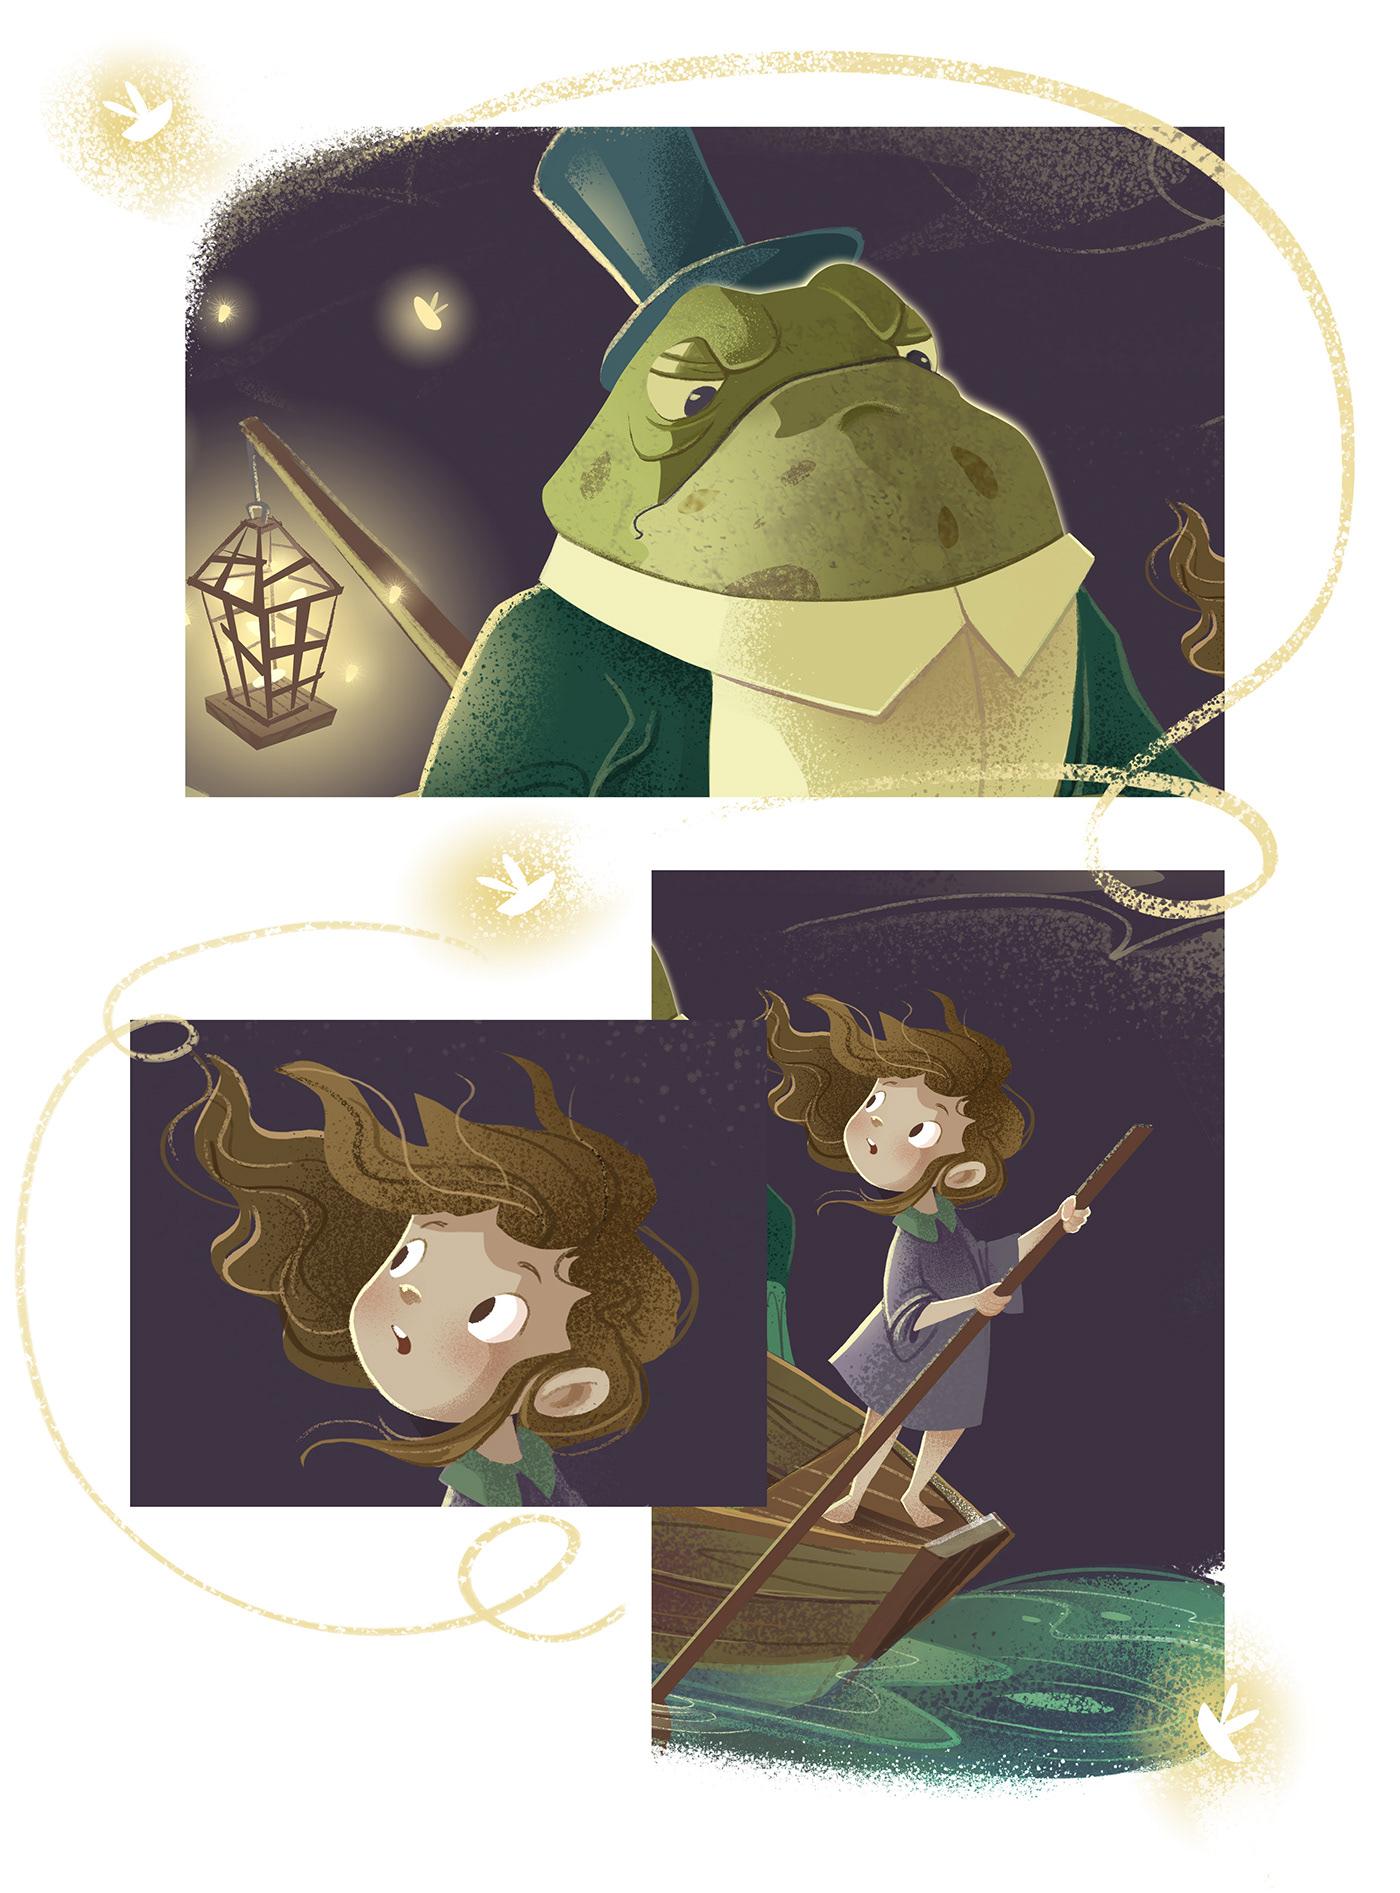 Adobe Photoshop Character design  children's story Digital Art  digital paint fantasy frog ILLUSTRATION  Ispiration Magic